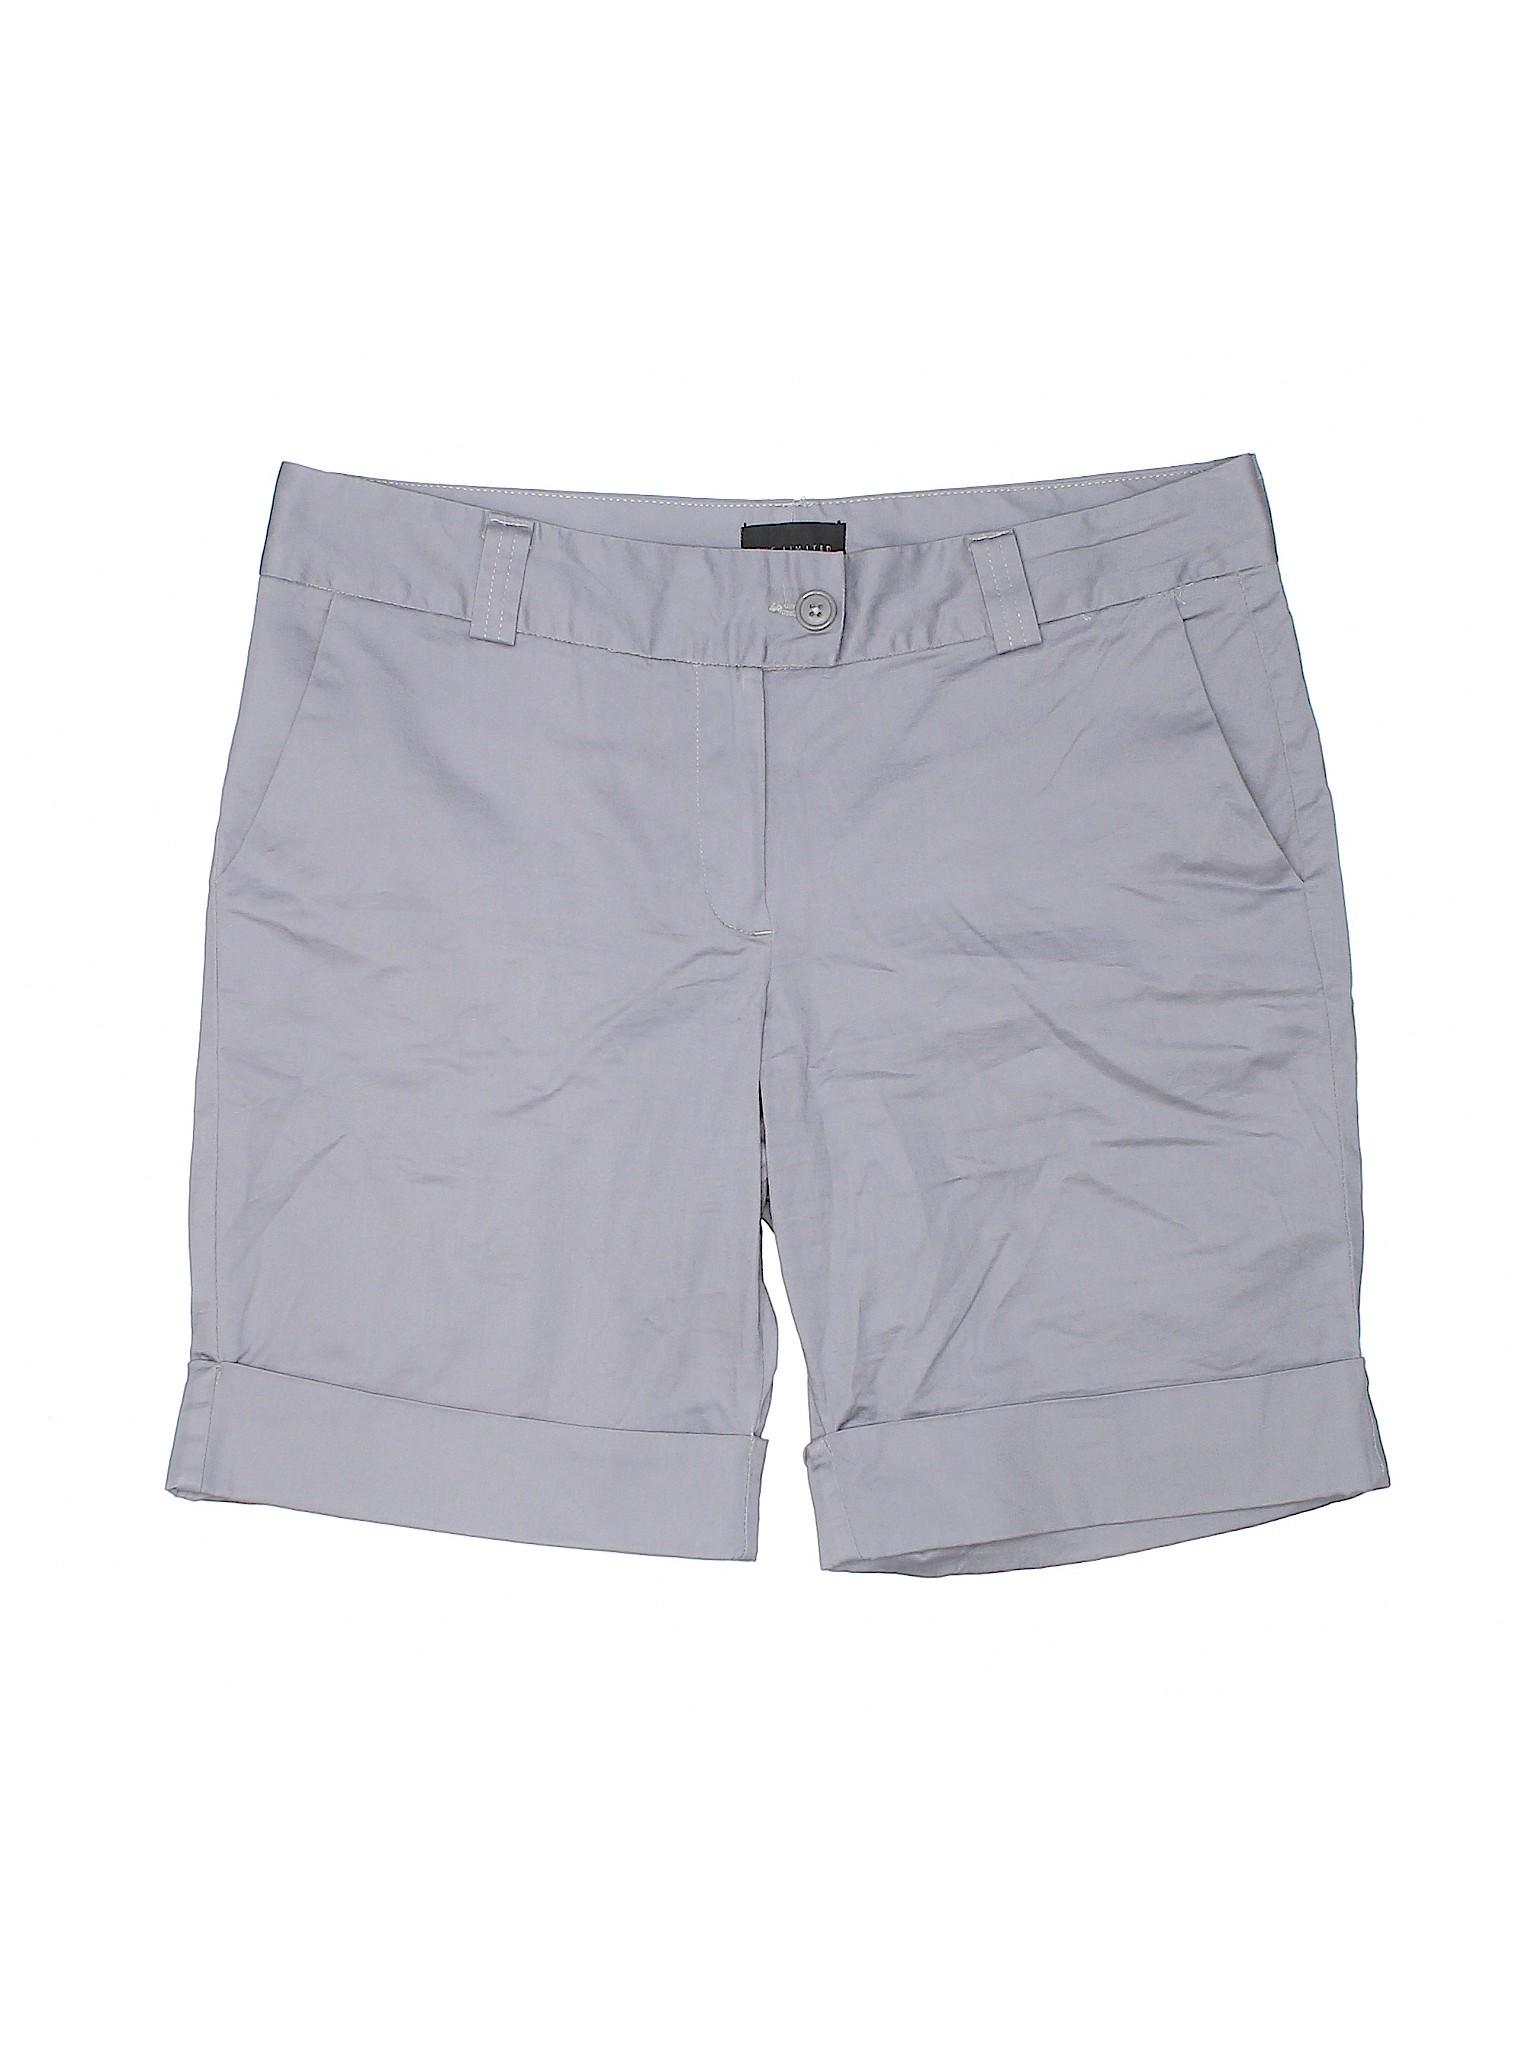 winter Limited Boutique Shorts The Khaki 8qwxZg